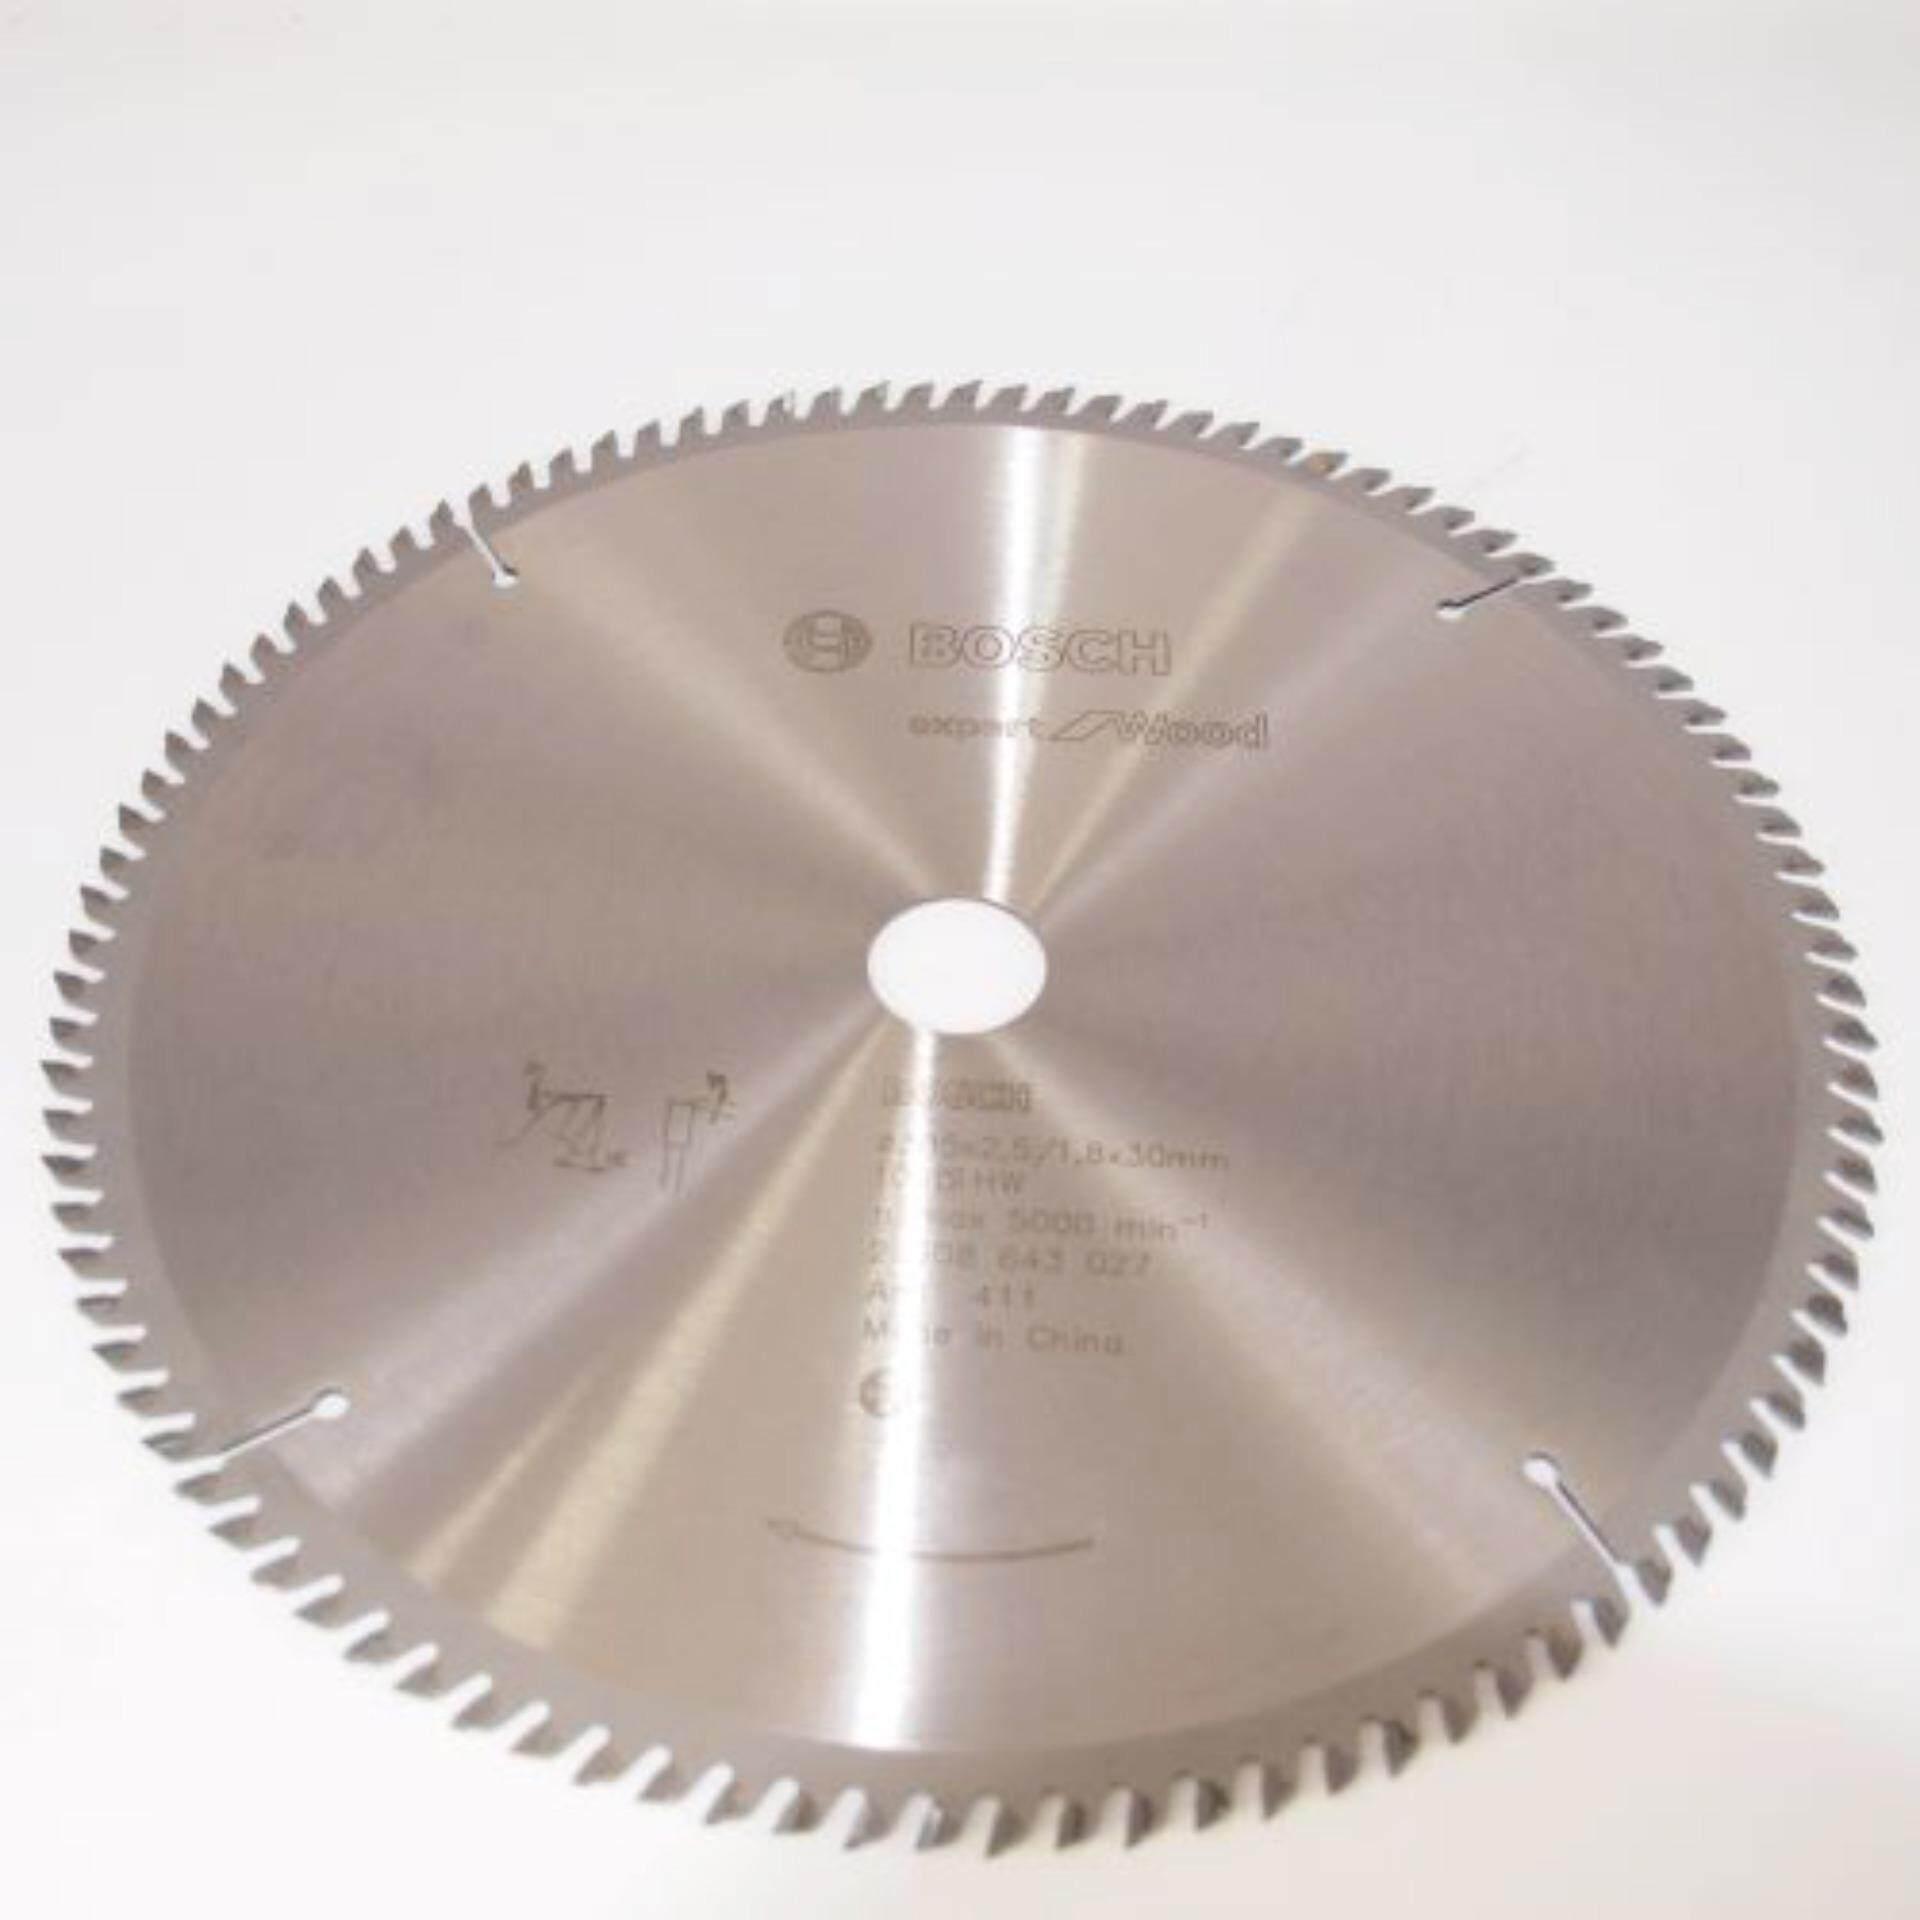 Bosch TCT Circular Saw Blade 305mm (12) x 2.5/1.8 x 30mm x 100T (Expert For Wood) 2608643027